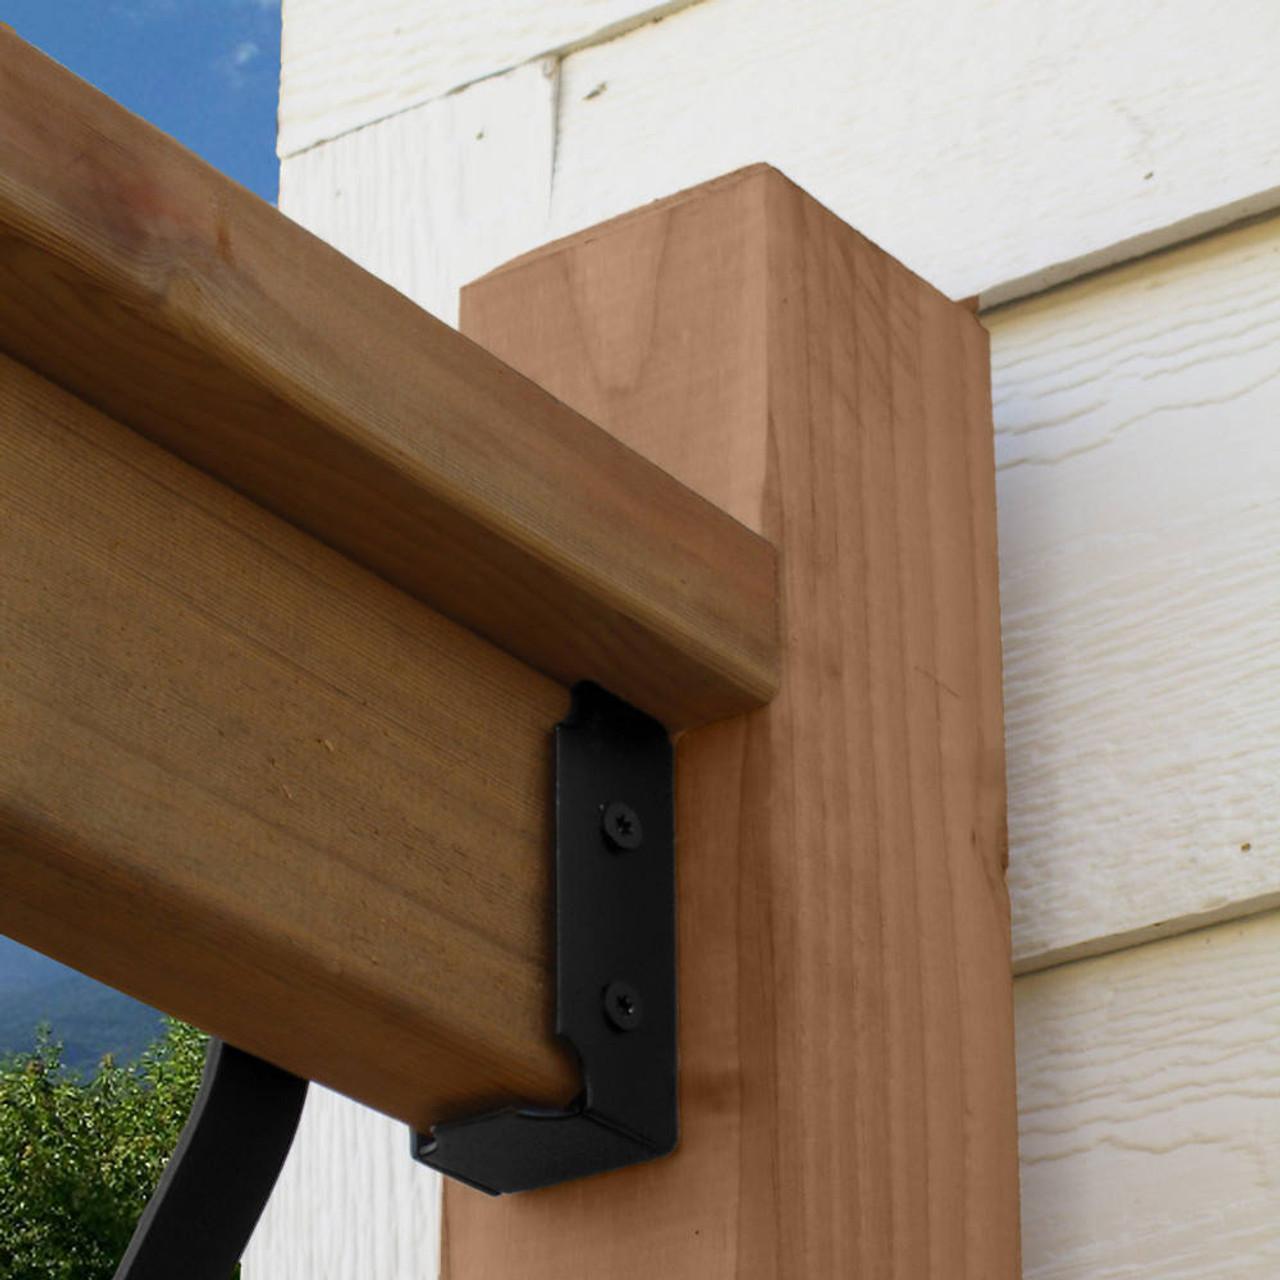 2 x 4 Wood Rail Installed with OZCO 2X4-TR Top Rail Saddle